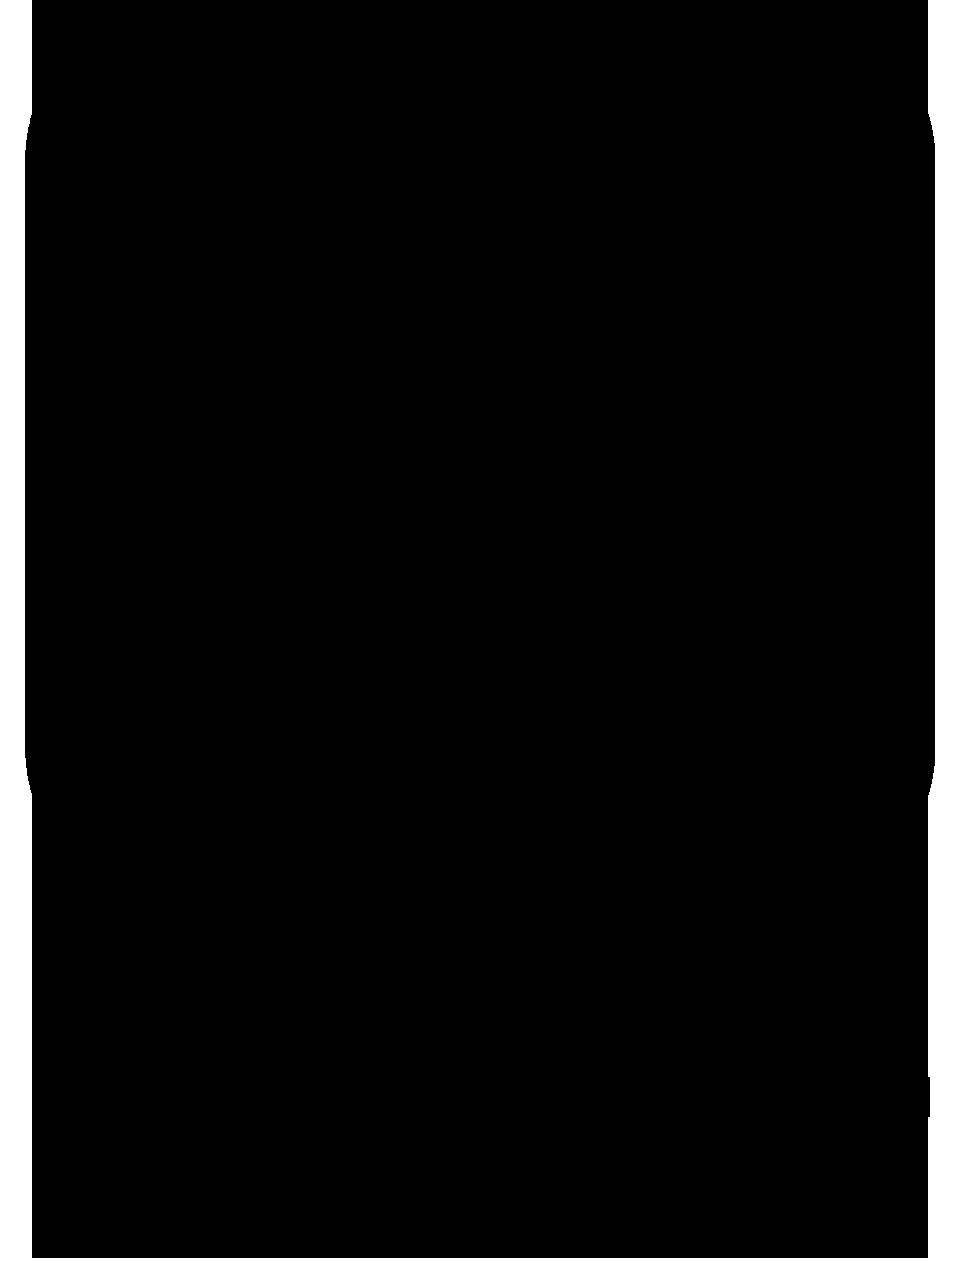 VEZT_Logo_black.png